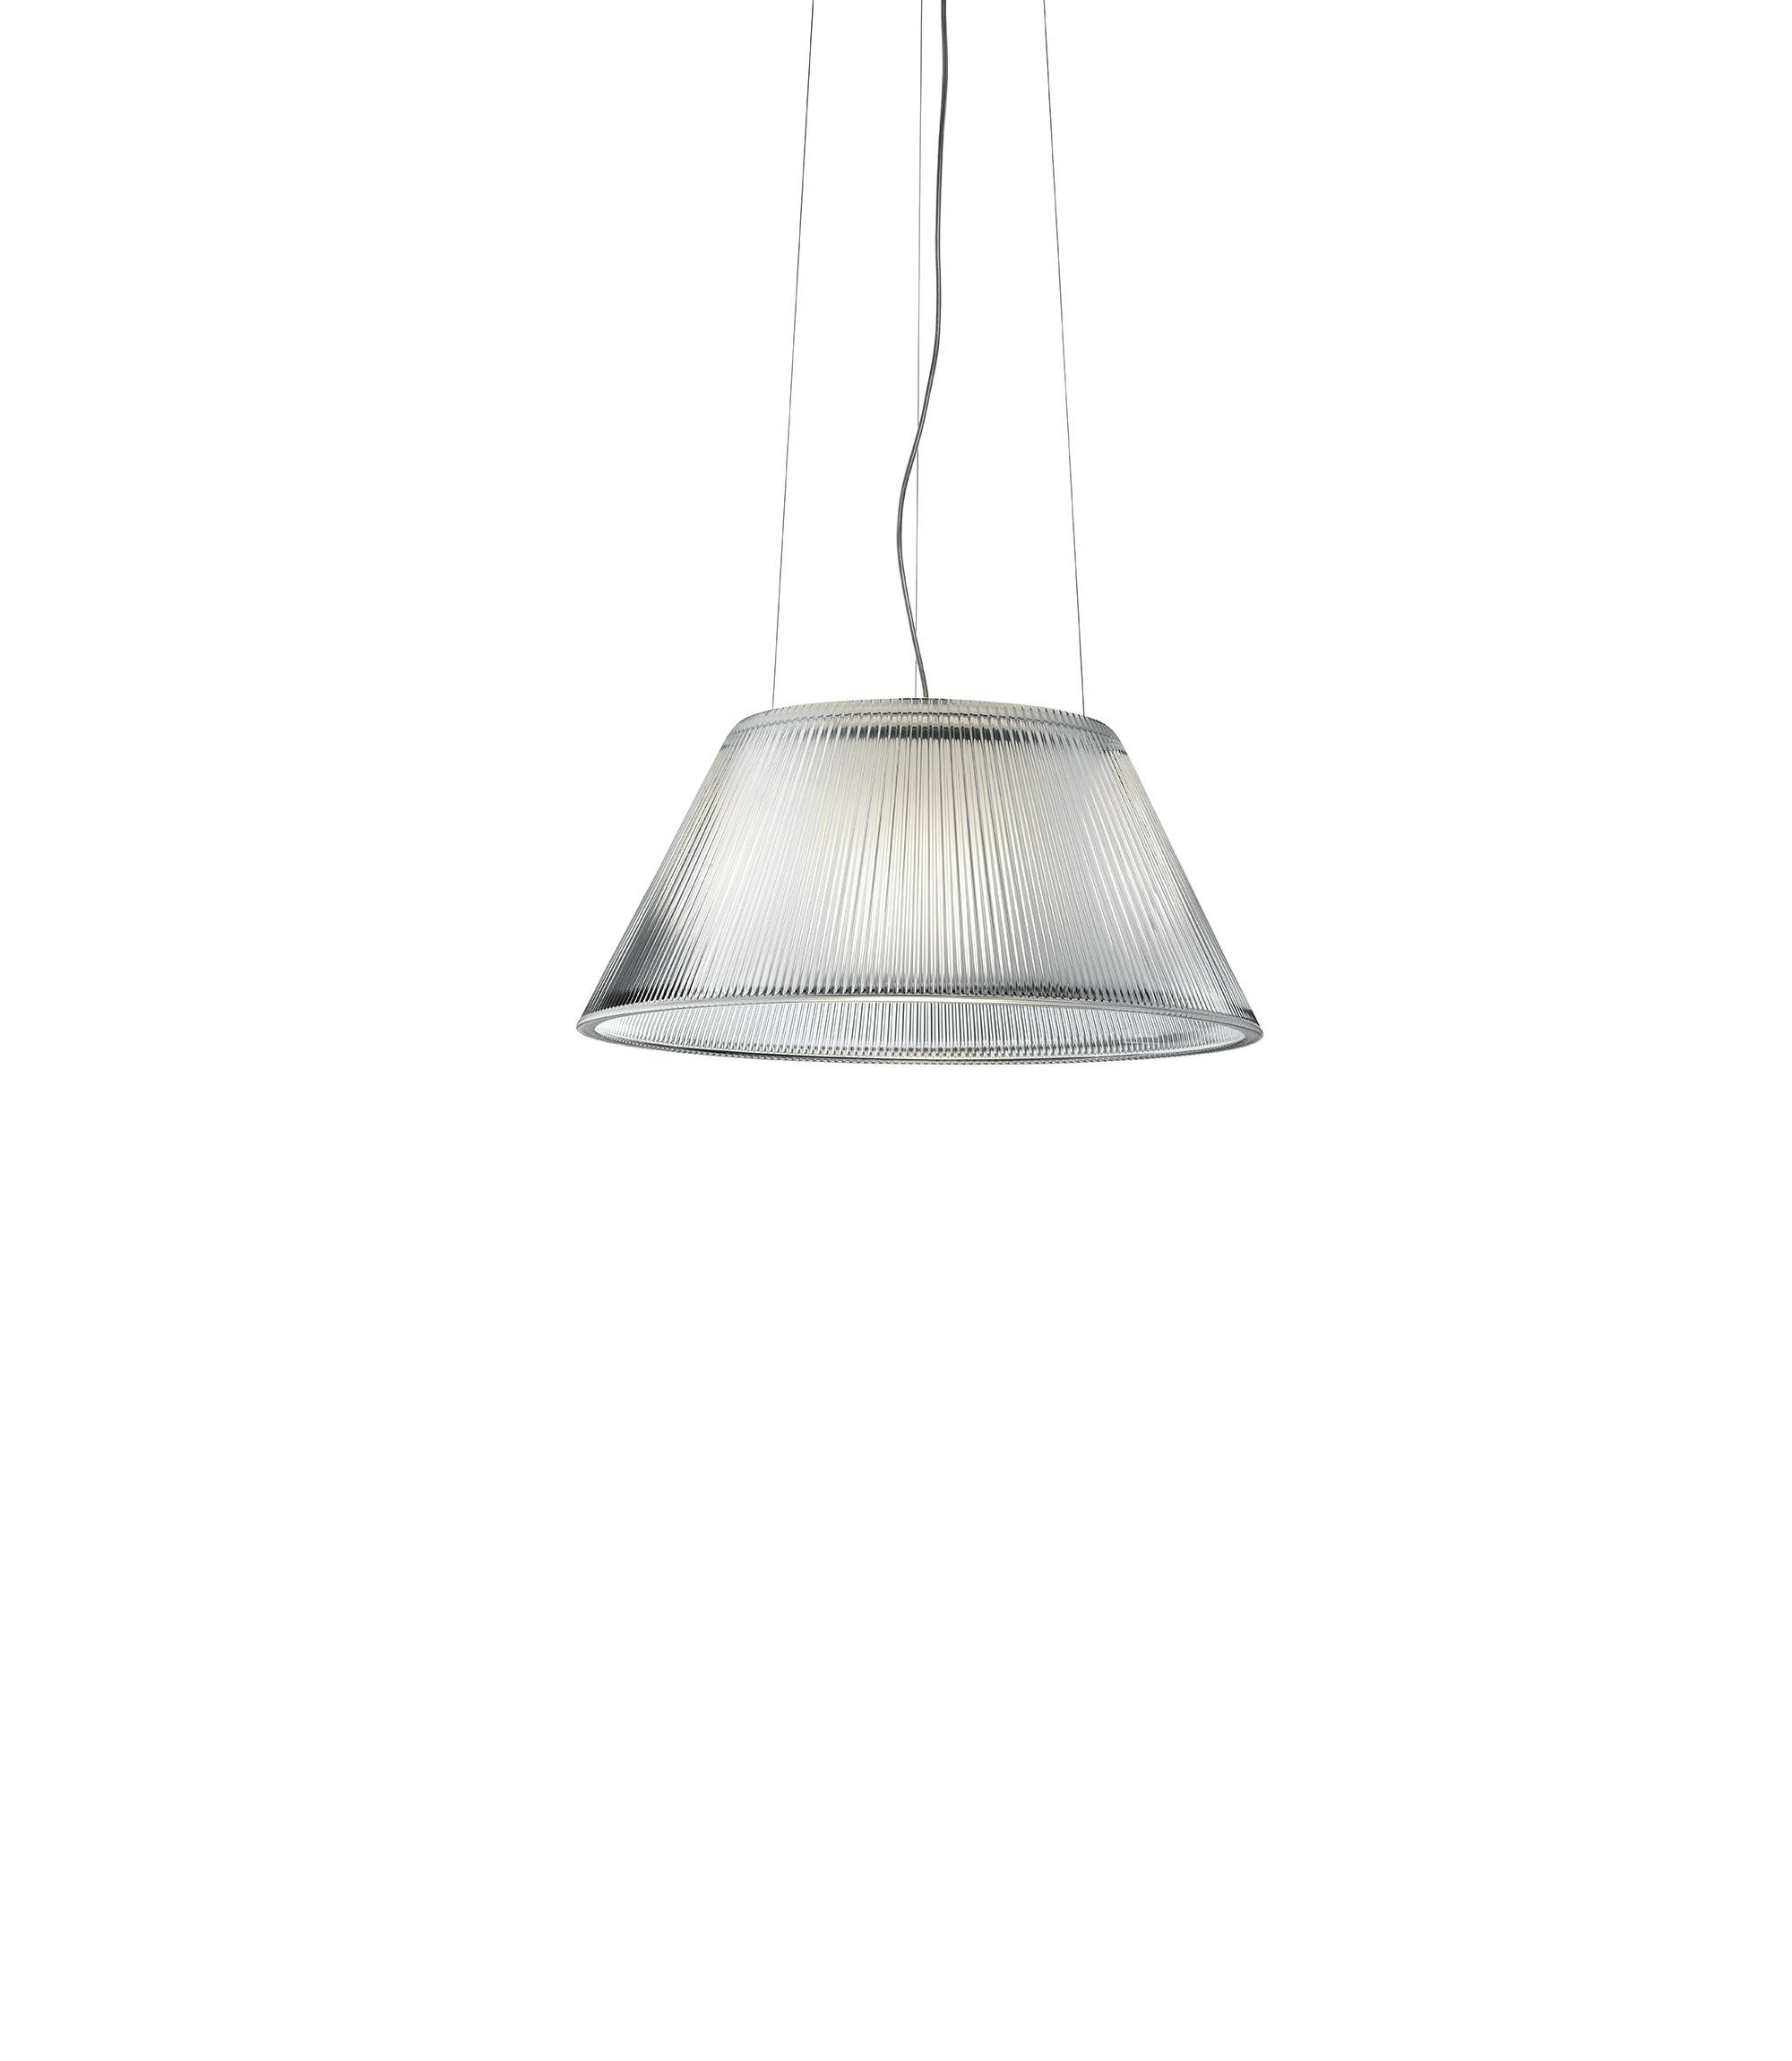 Pendant Lamp Wiring Instructions